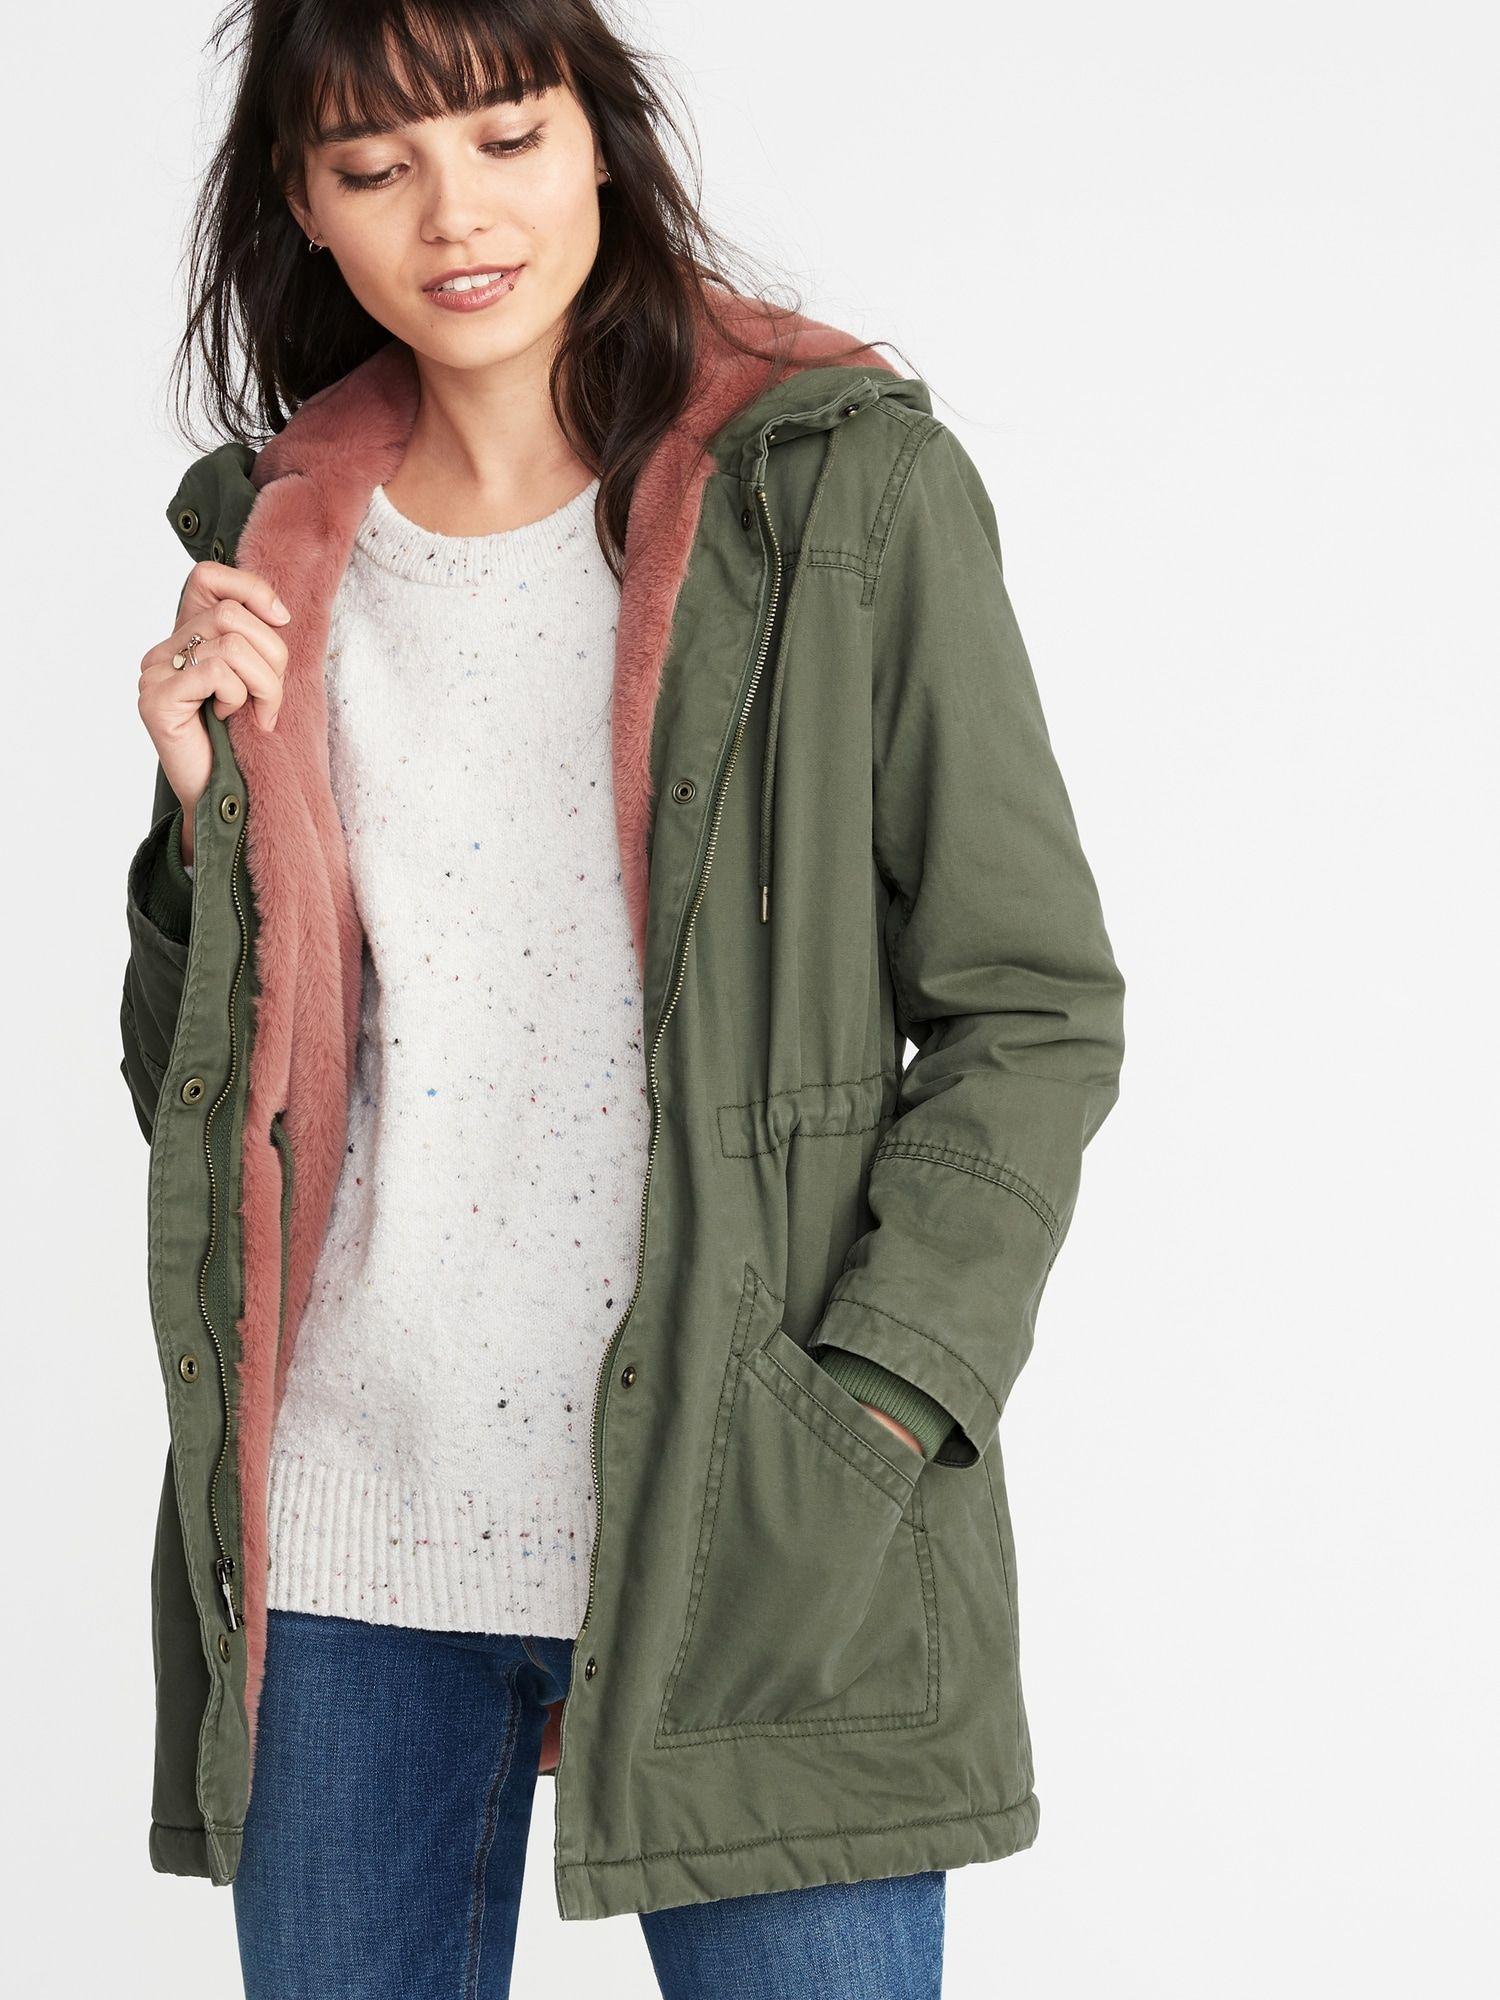 Hooded Utility Parka for Women   Old Navy   Parka coat, Jackets